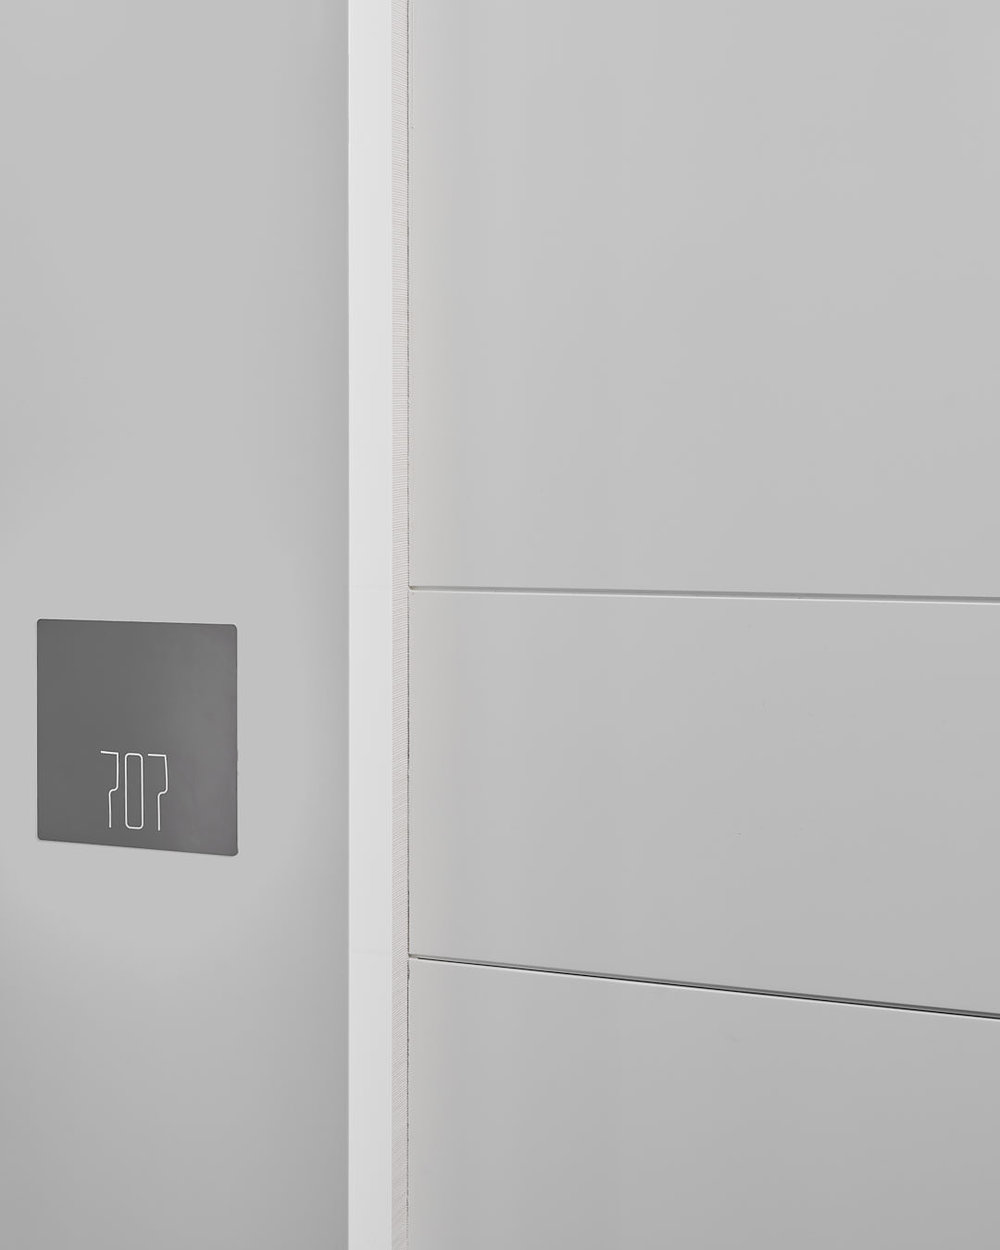 7 St. Thomas / Architectural Signage